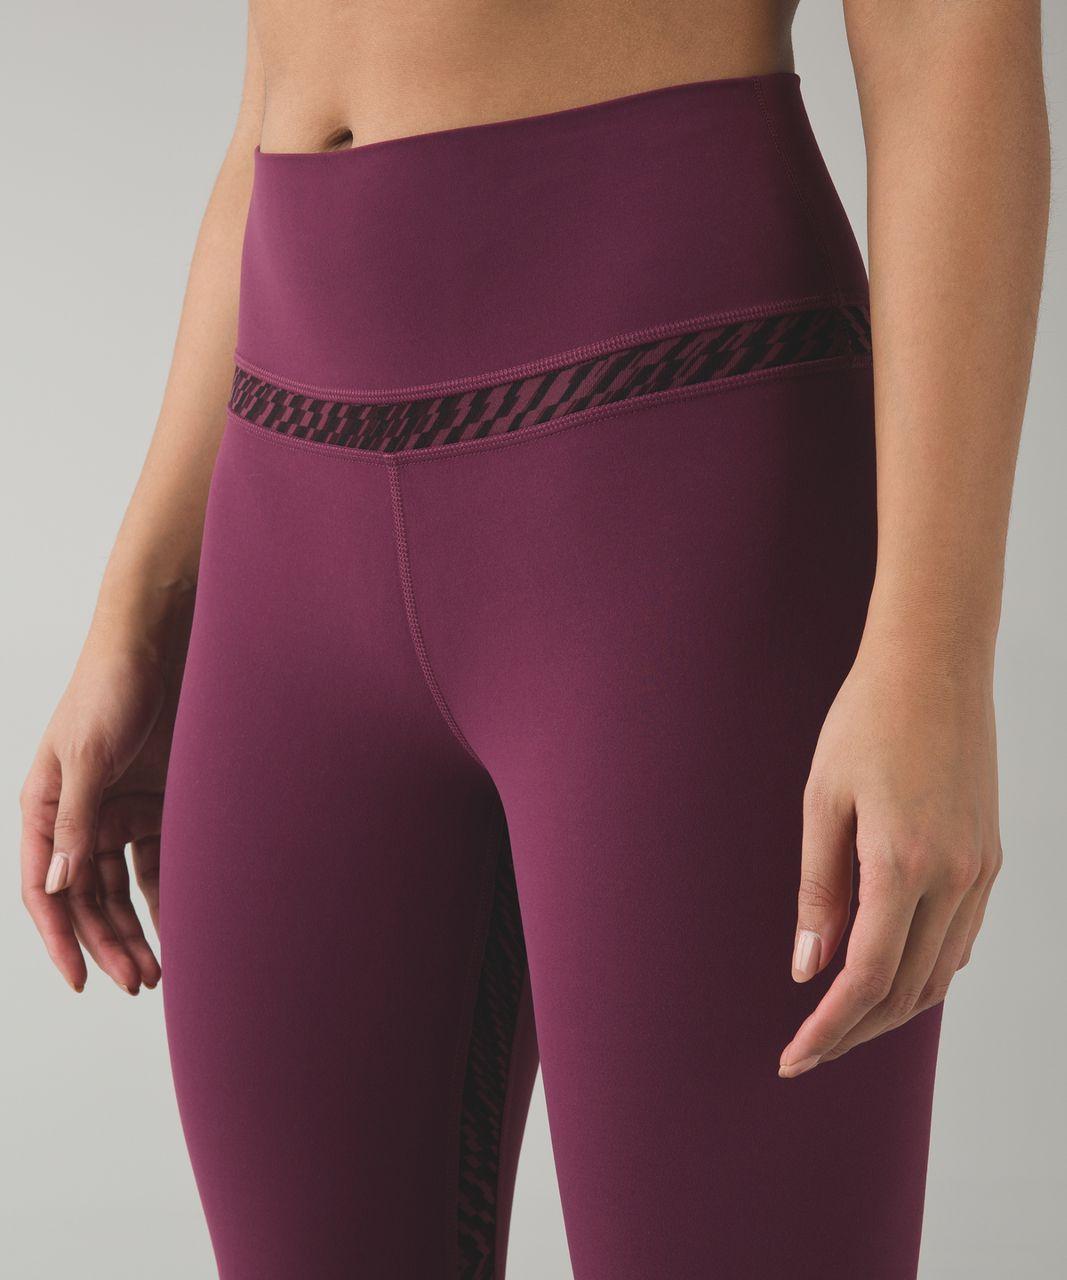 Lululemon Align Pant - Red Grape / Shifted Horizon Red Grape Black